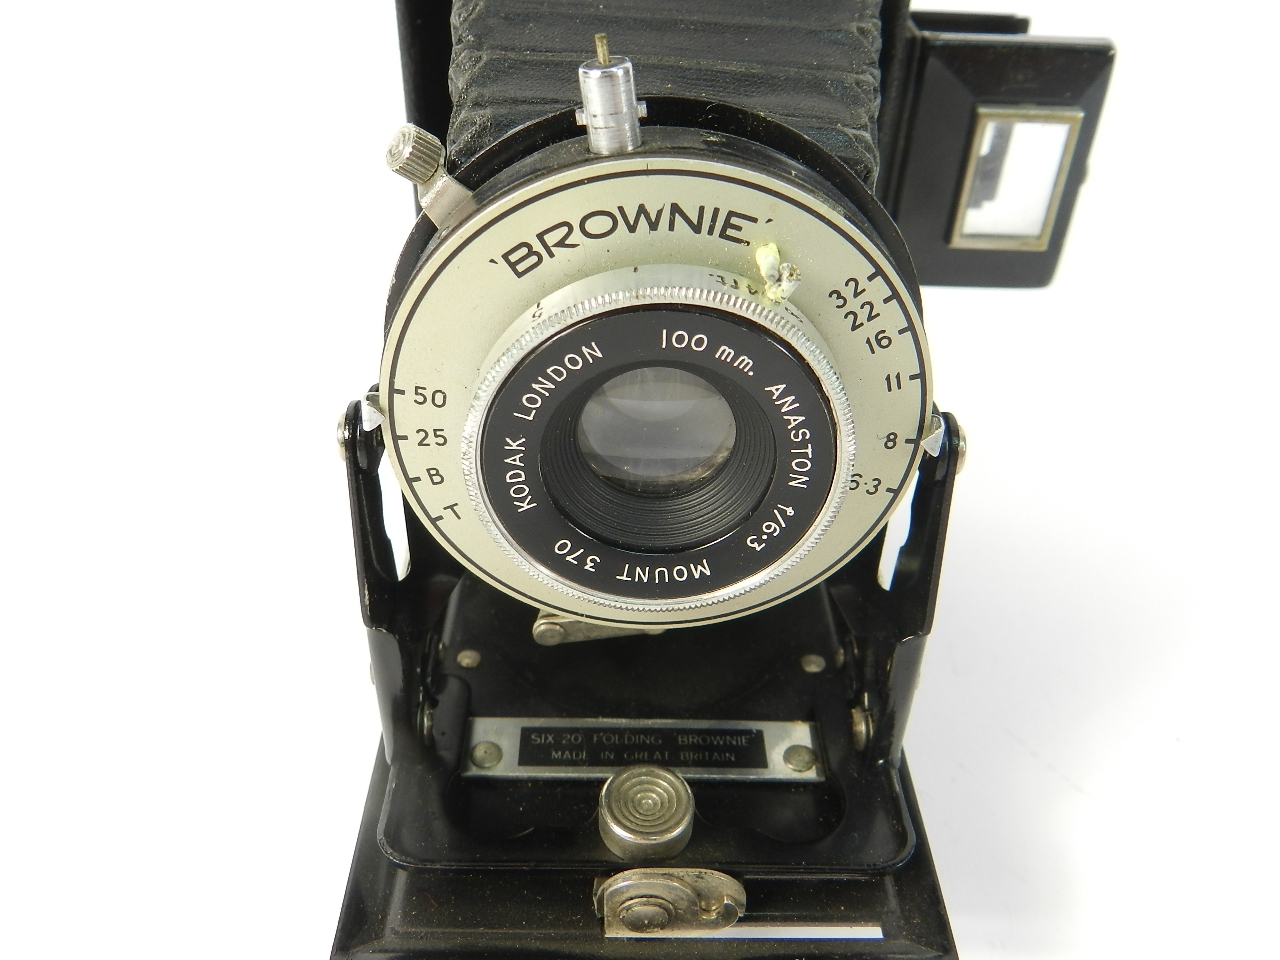 Imagen KODAK SIX 20 FOLDING BROWNIE AÑO 1940 38019